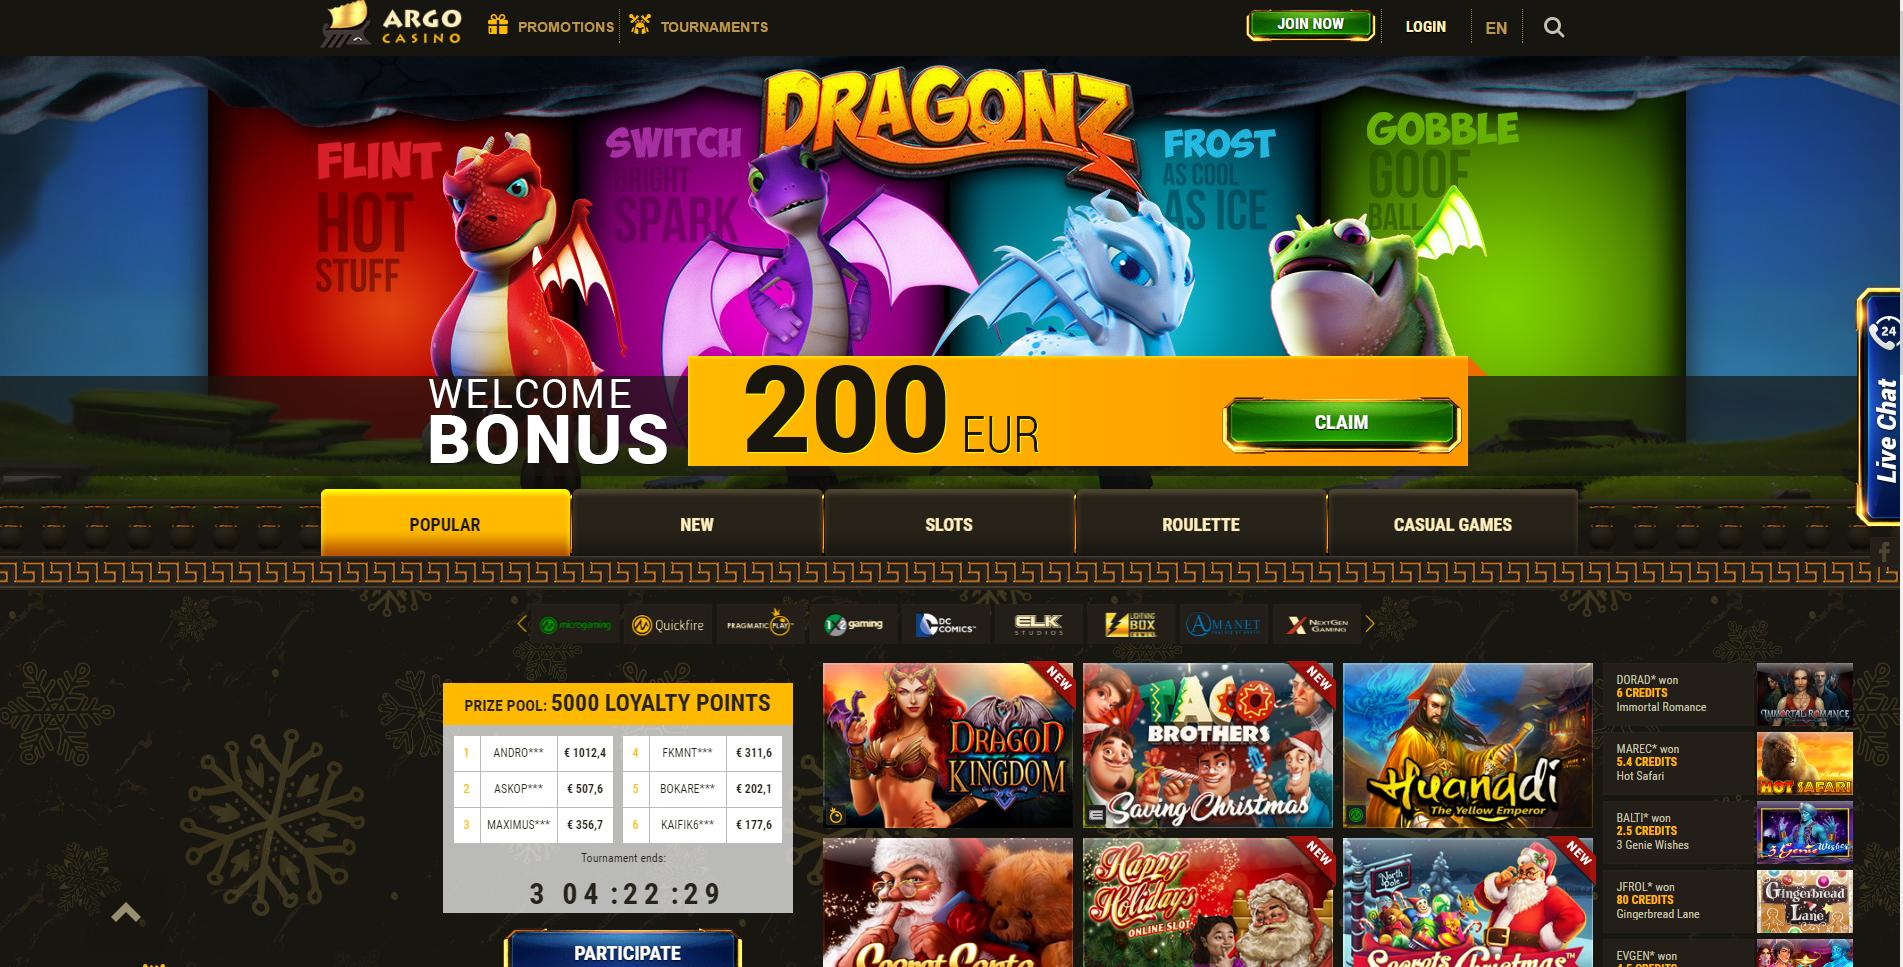 argo casino бездепозитный бонус